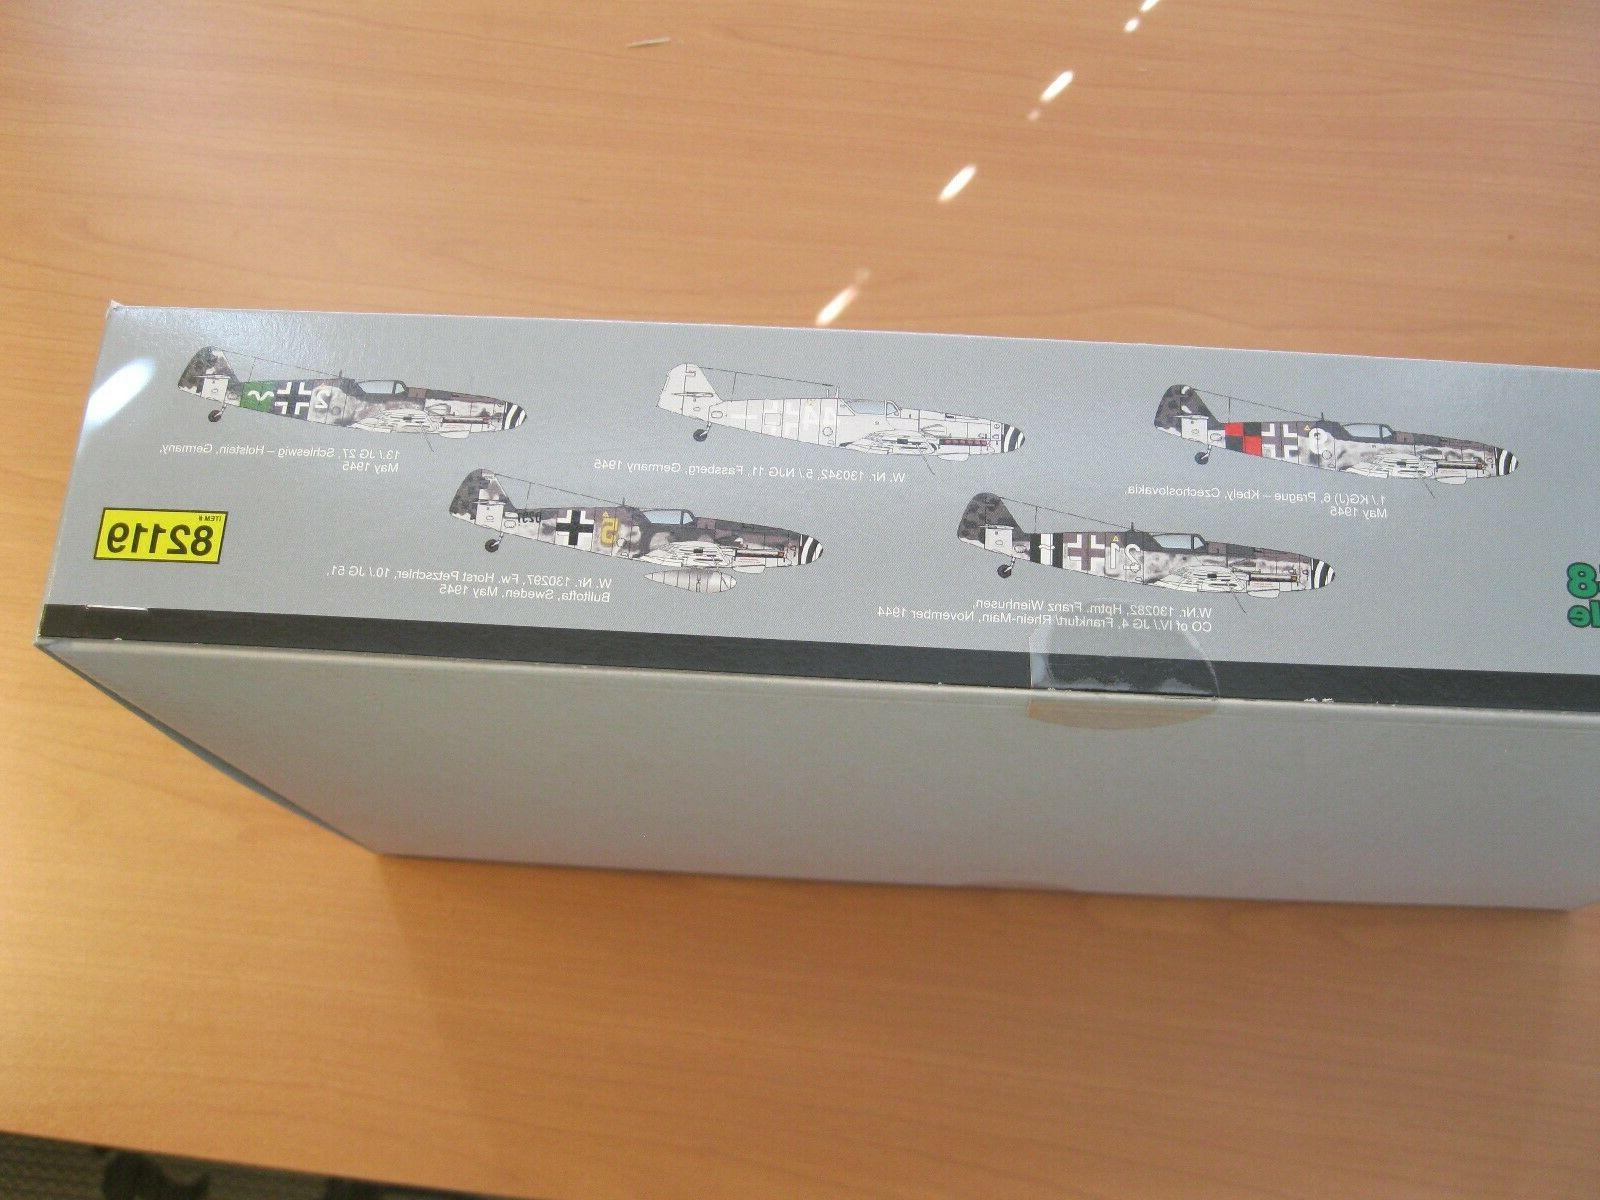 Eduard ProfiPack 109G-10 plastic